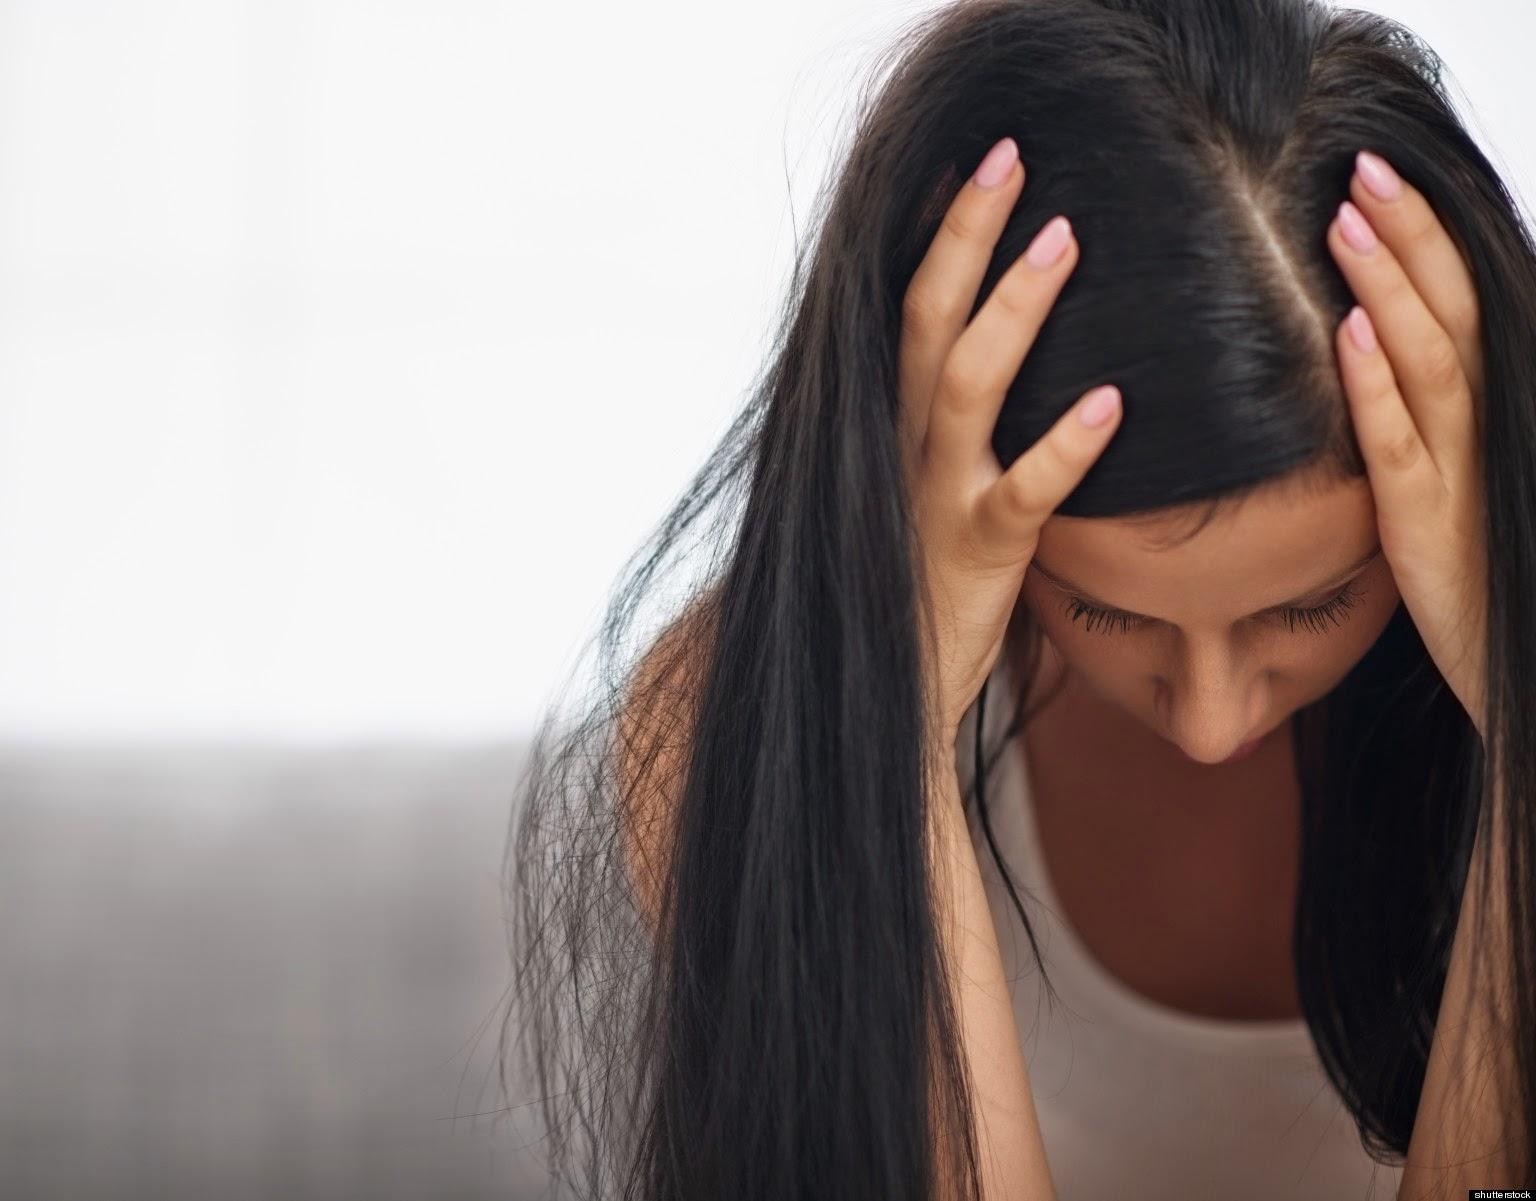 Treatment Goals for Bipolar II Disorder